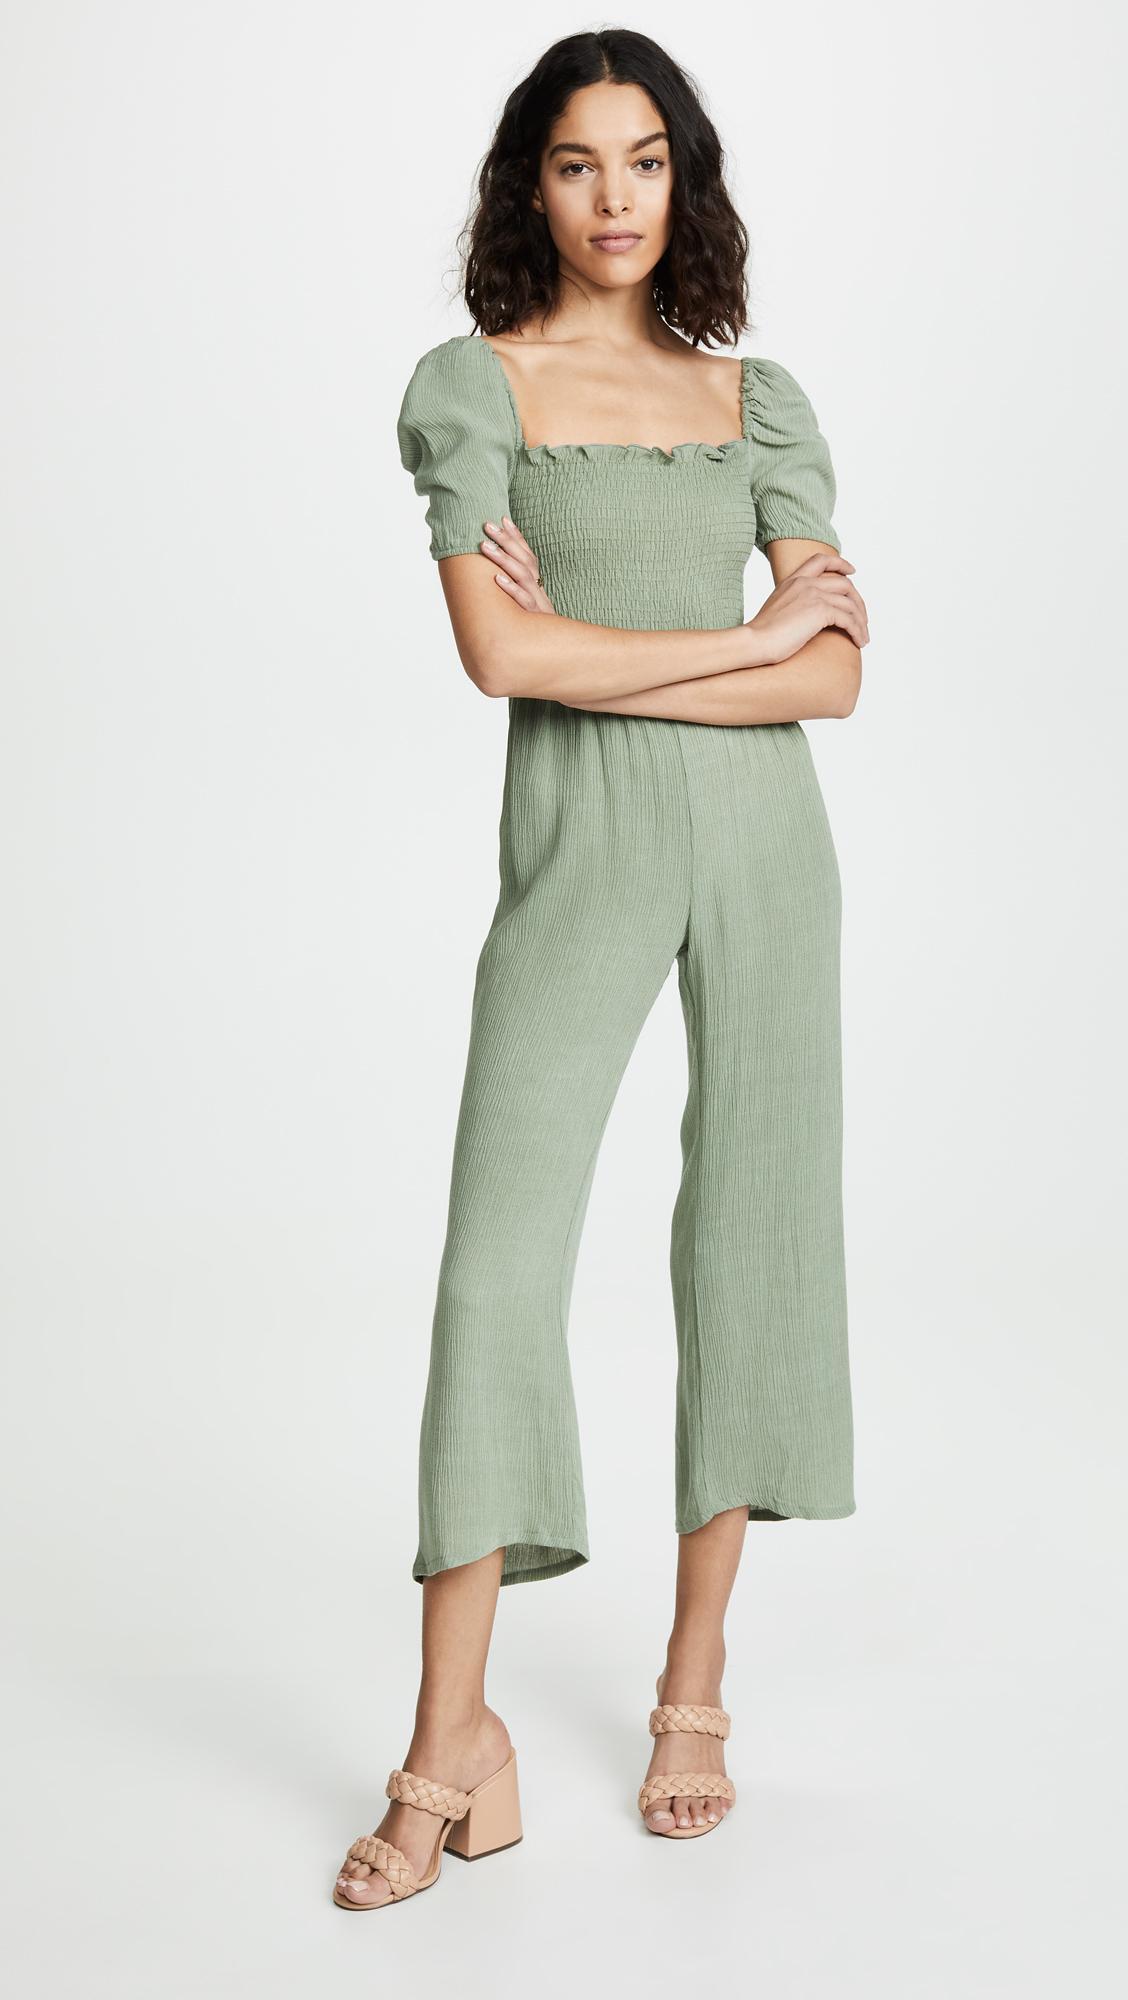 821e5f483786 Lyst - Flynn Skye Justine Jumpsuit in Green - Save 1%